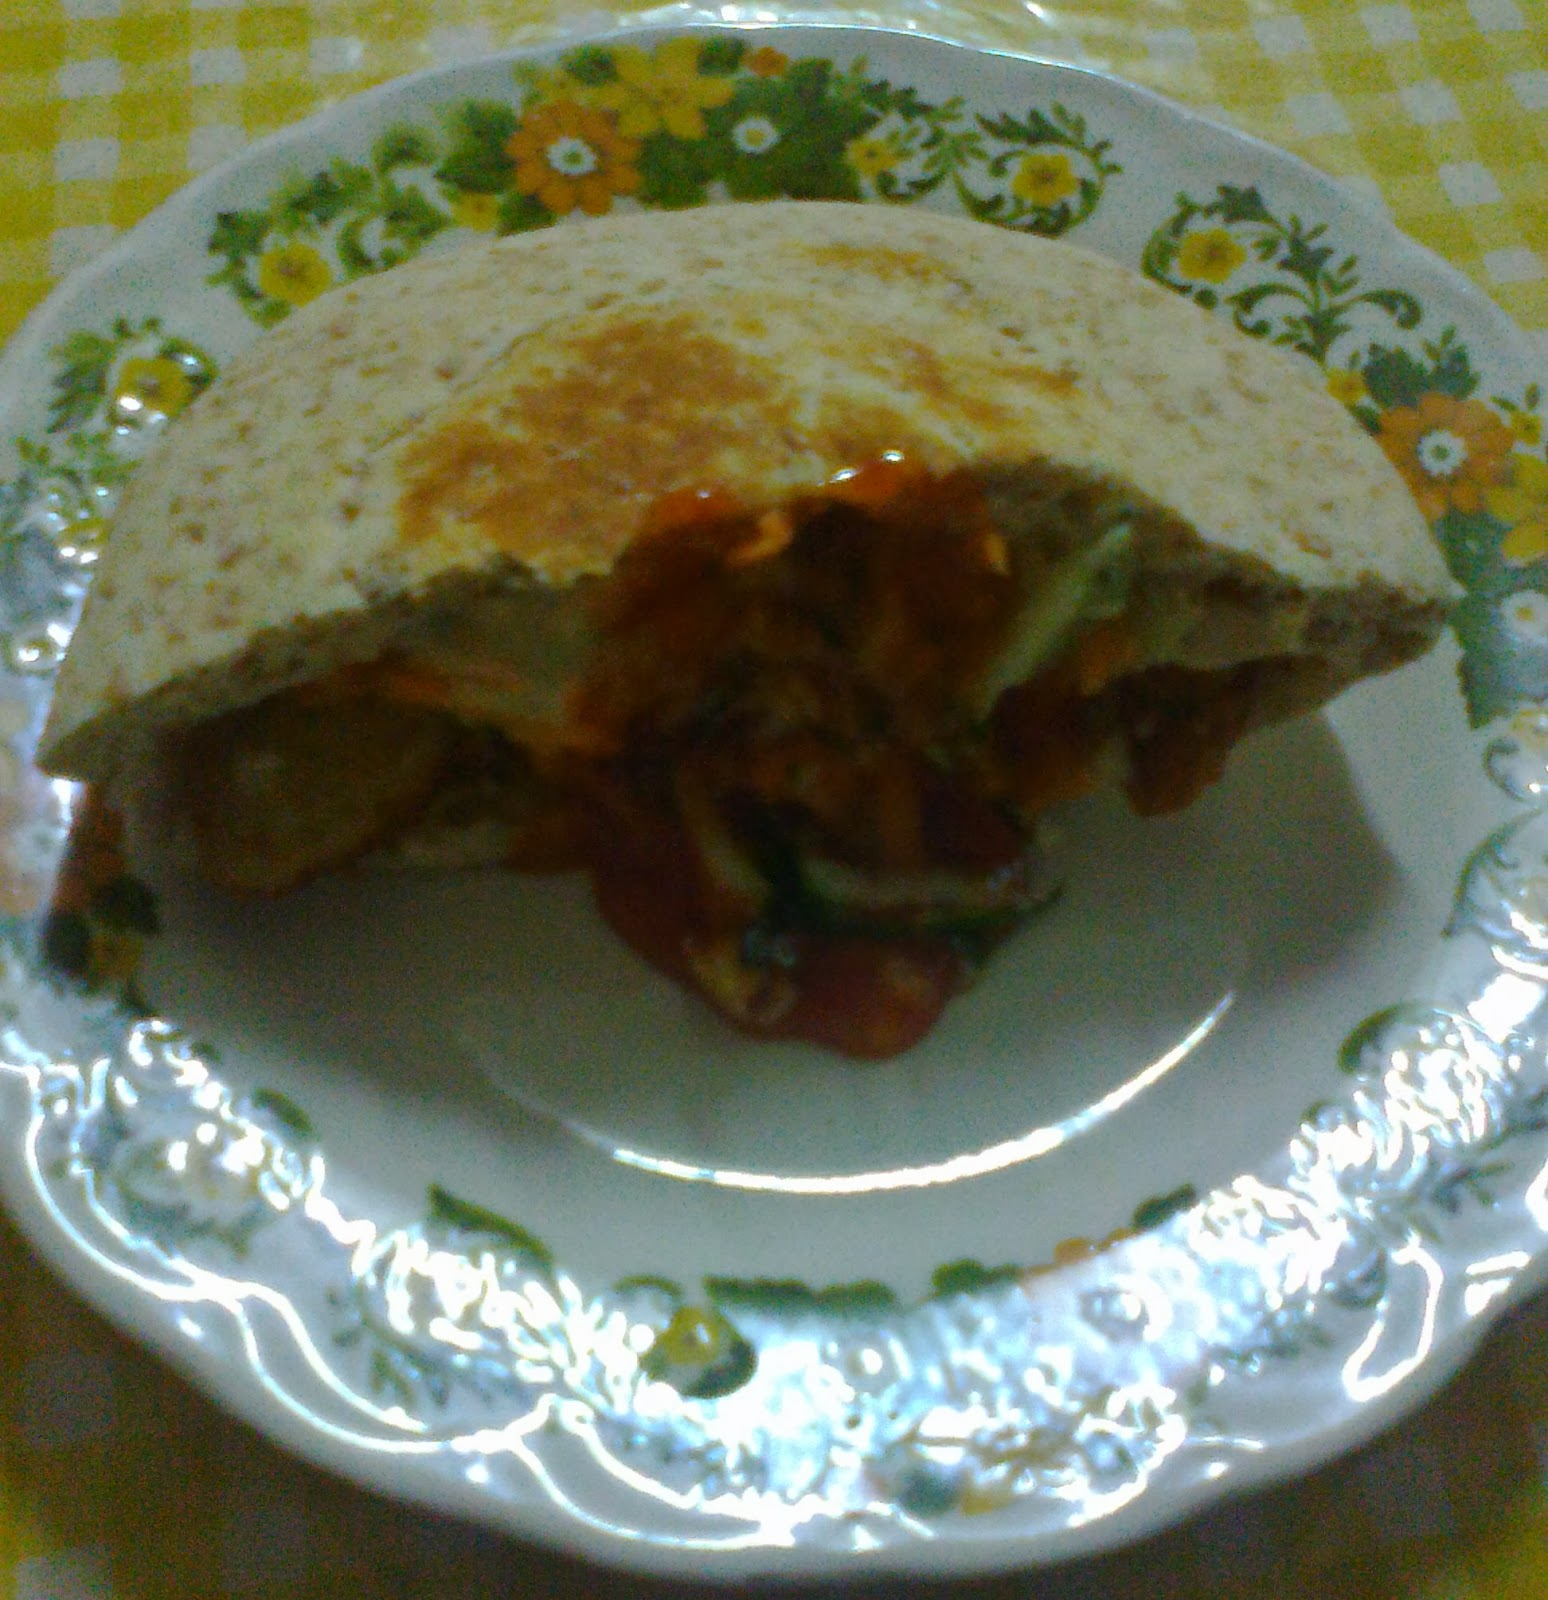 resepi bubur ayam ala thai  joglo Resepi Ayam Bakar Jakarta Enak dan Mudah